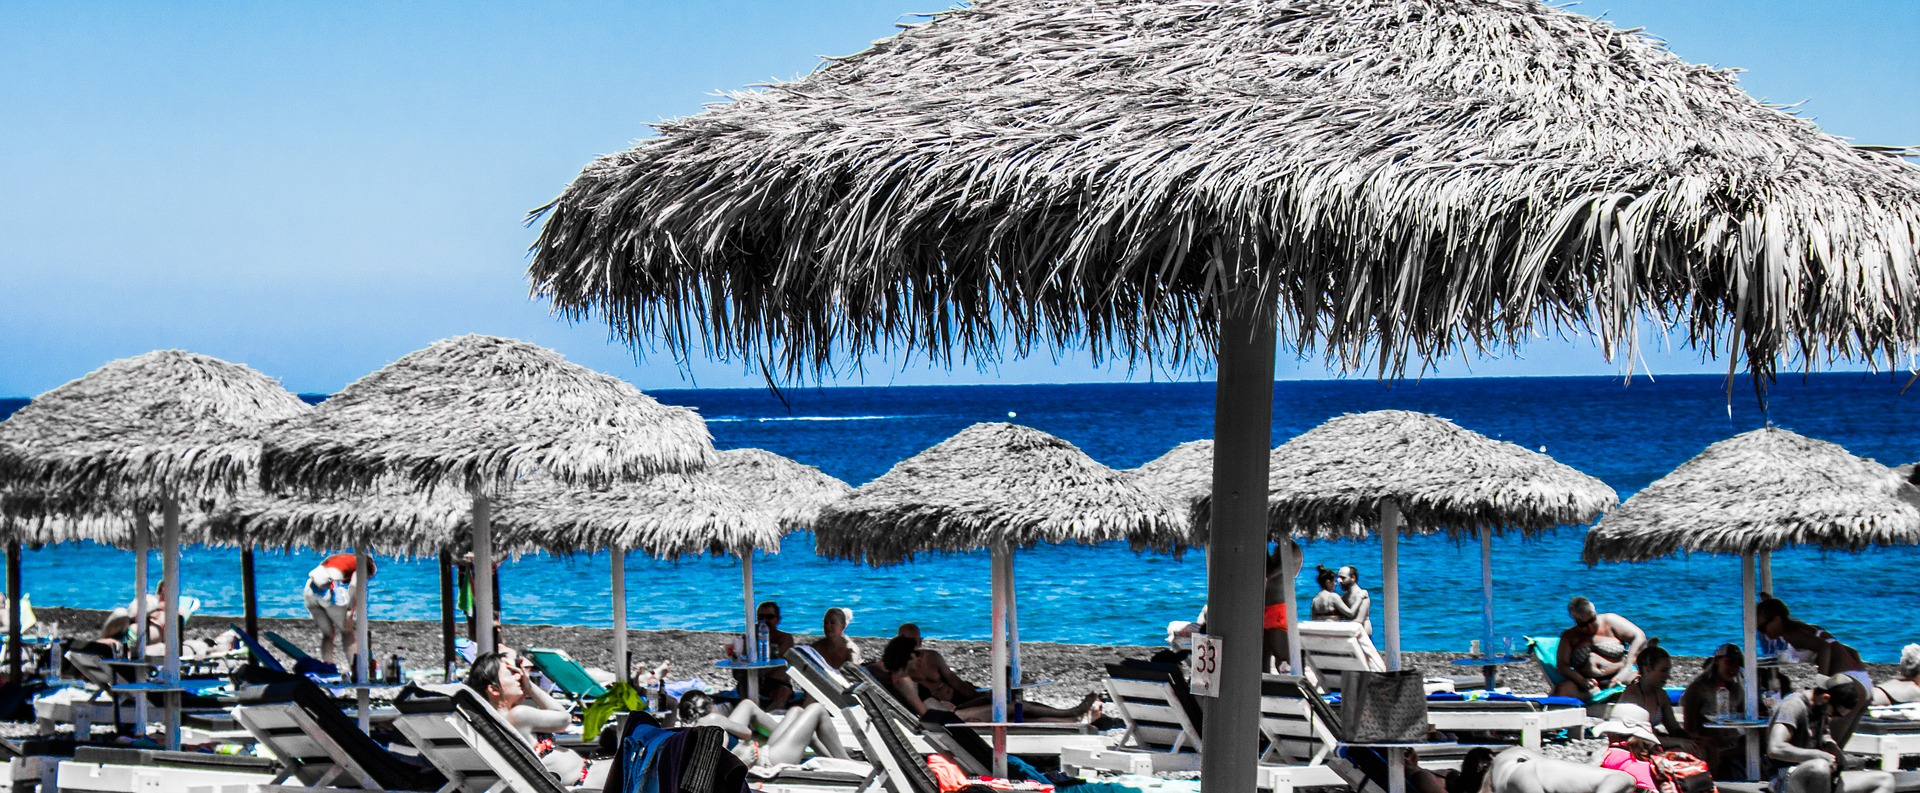 Organized Beaches